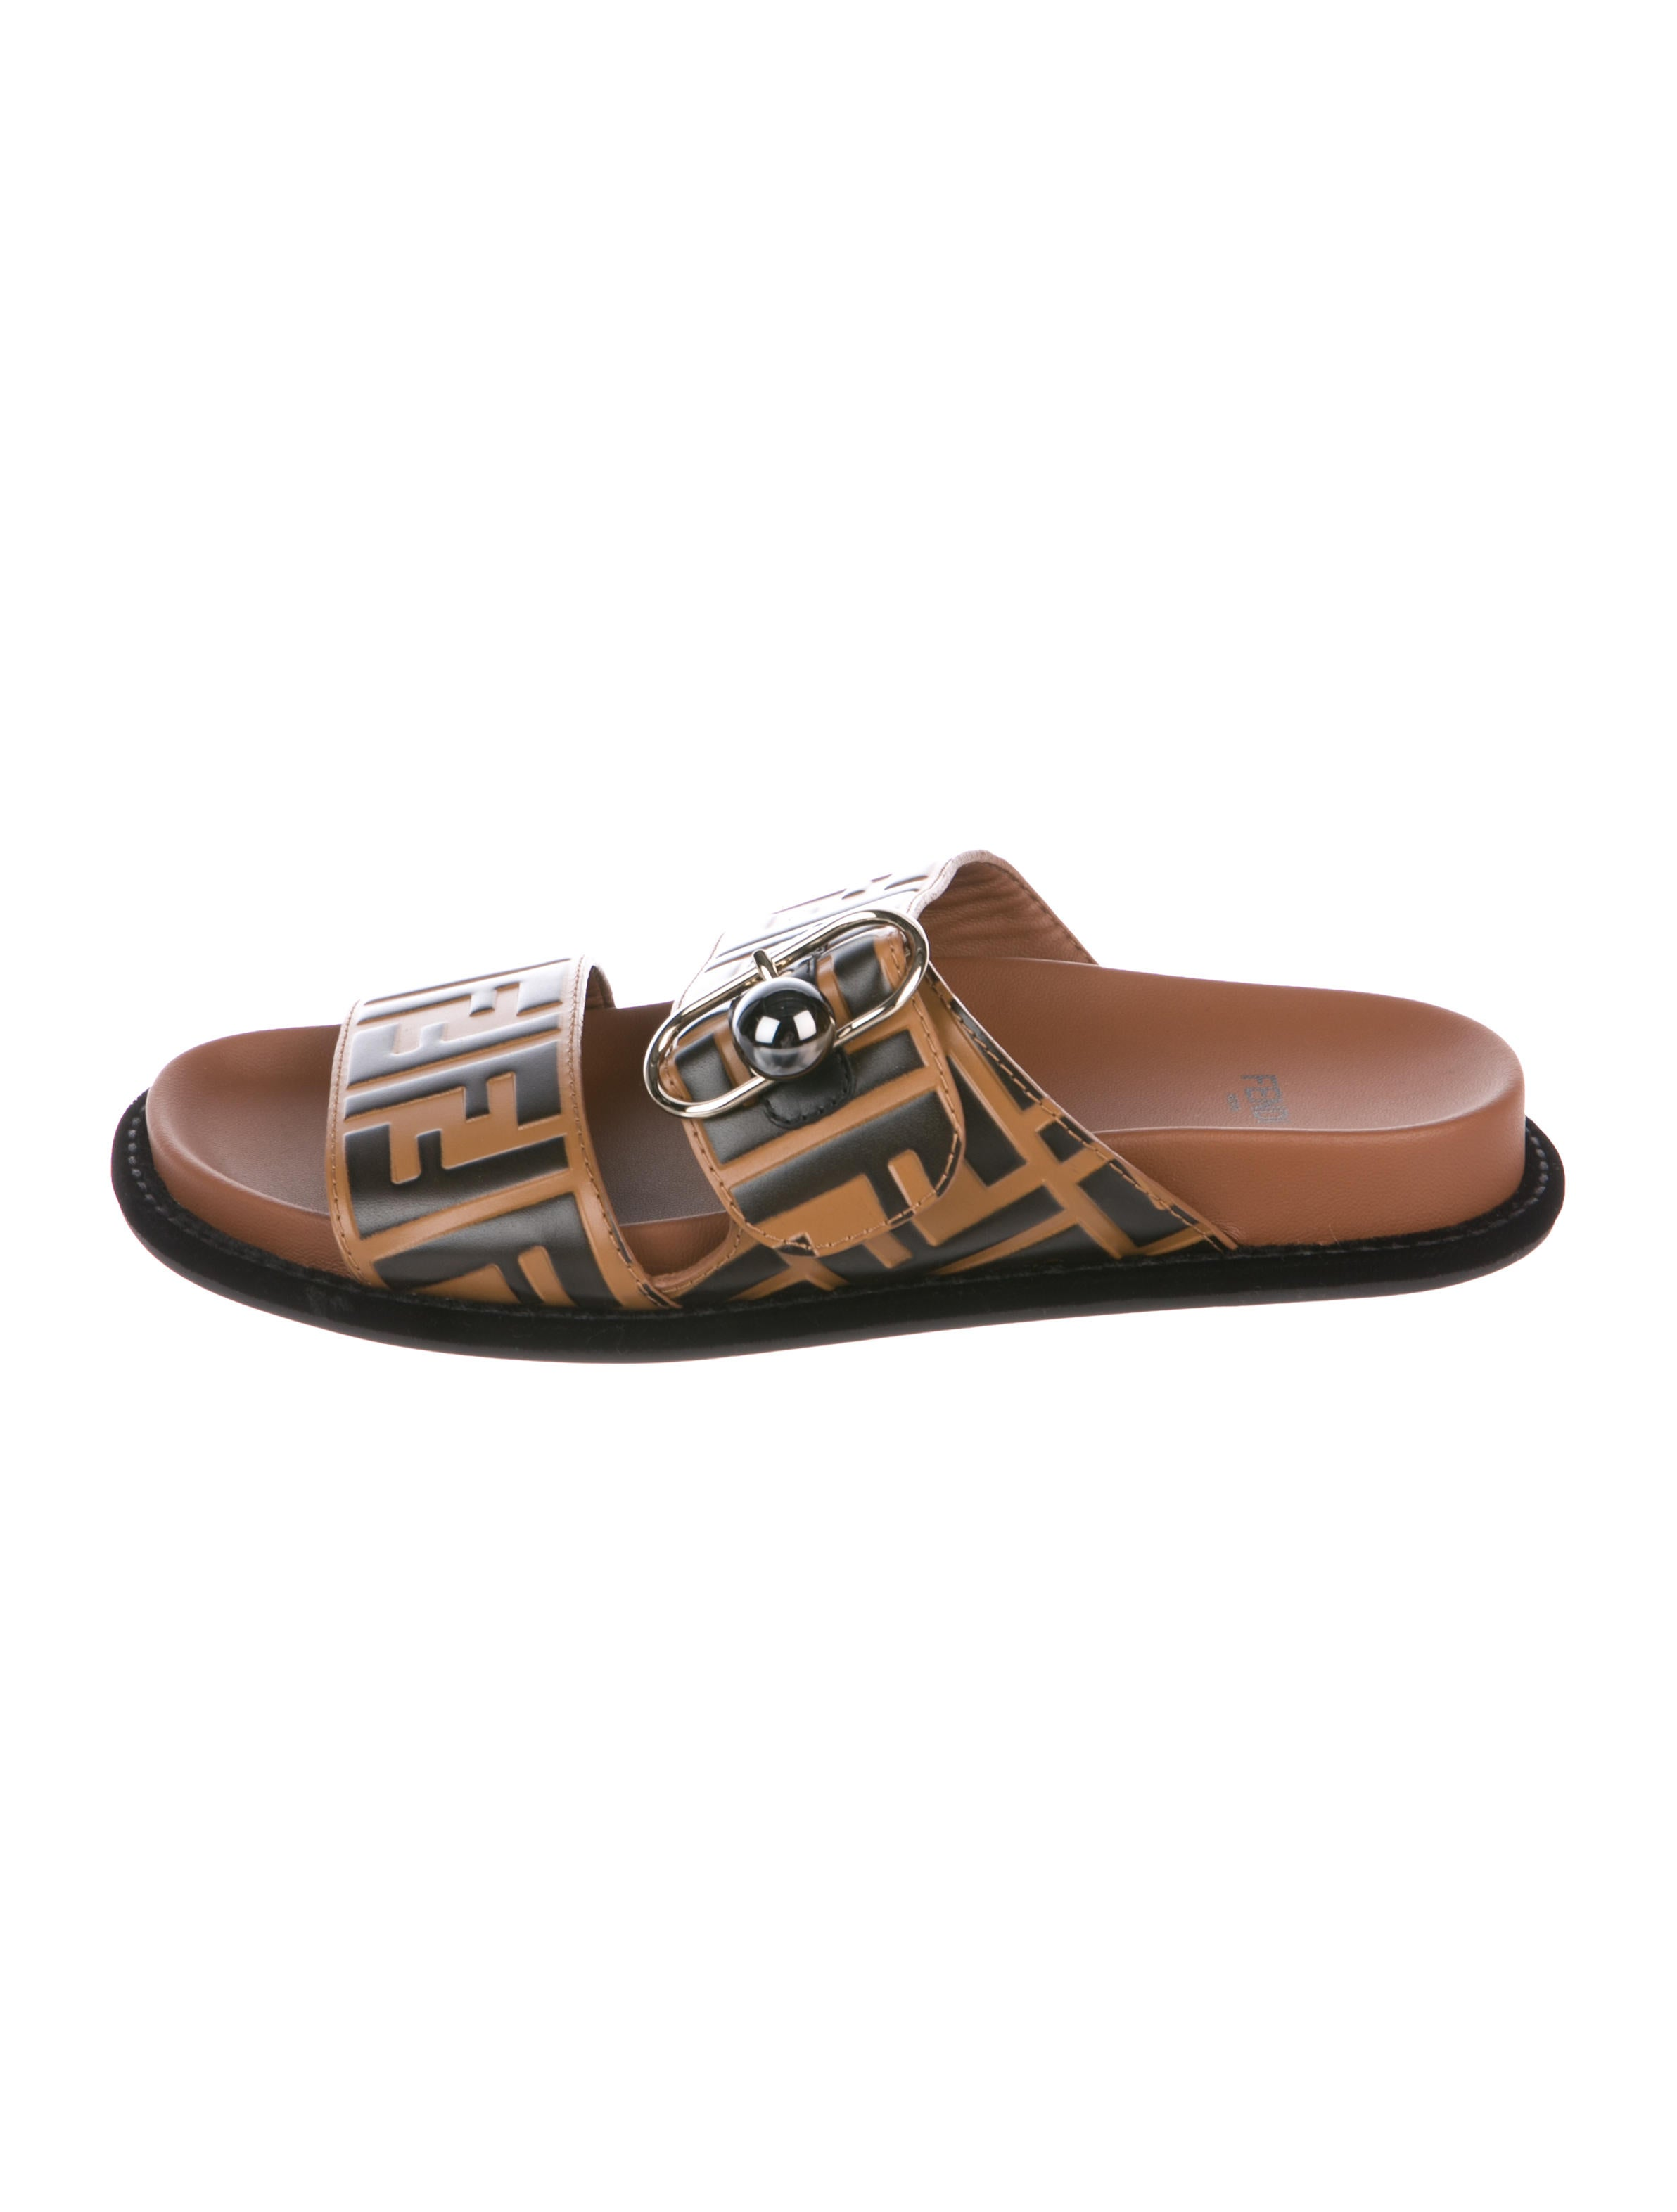 Fendi Pearland FF Leather Slide Sandals